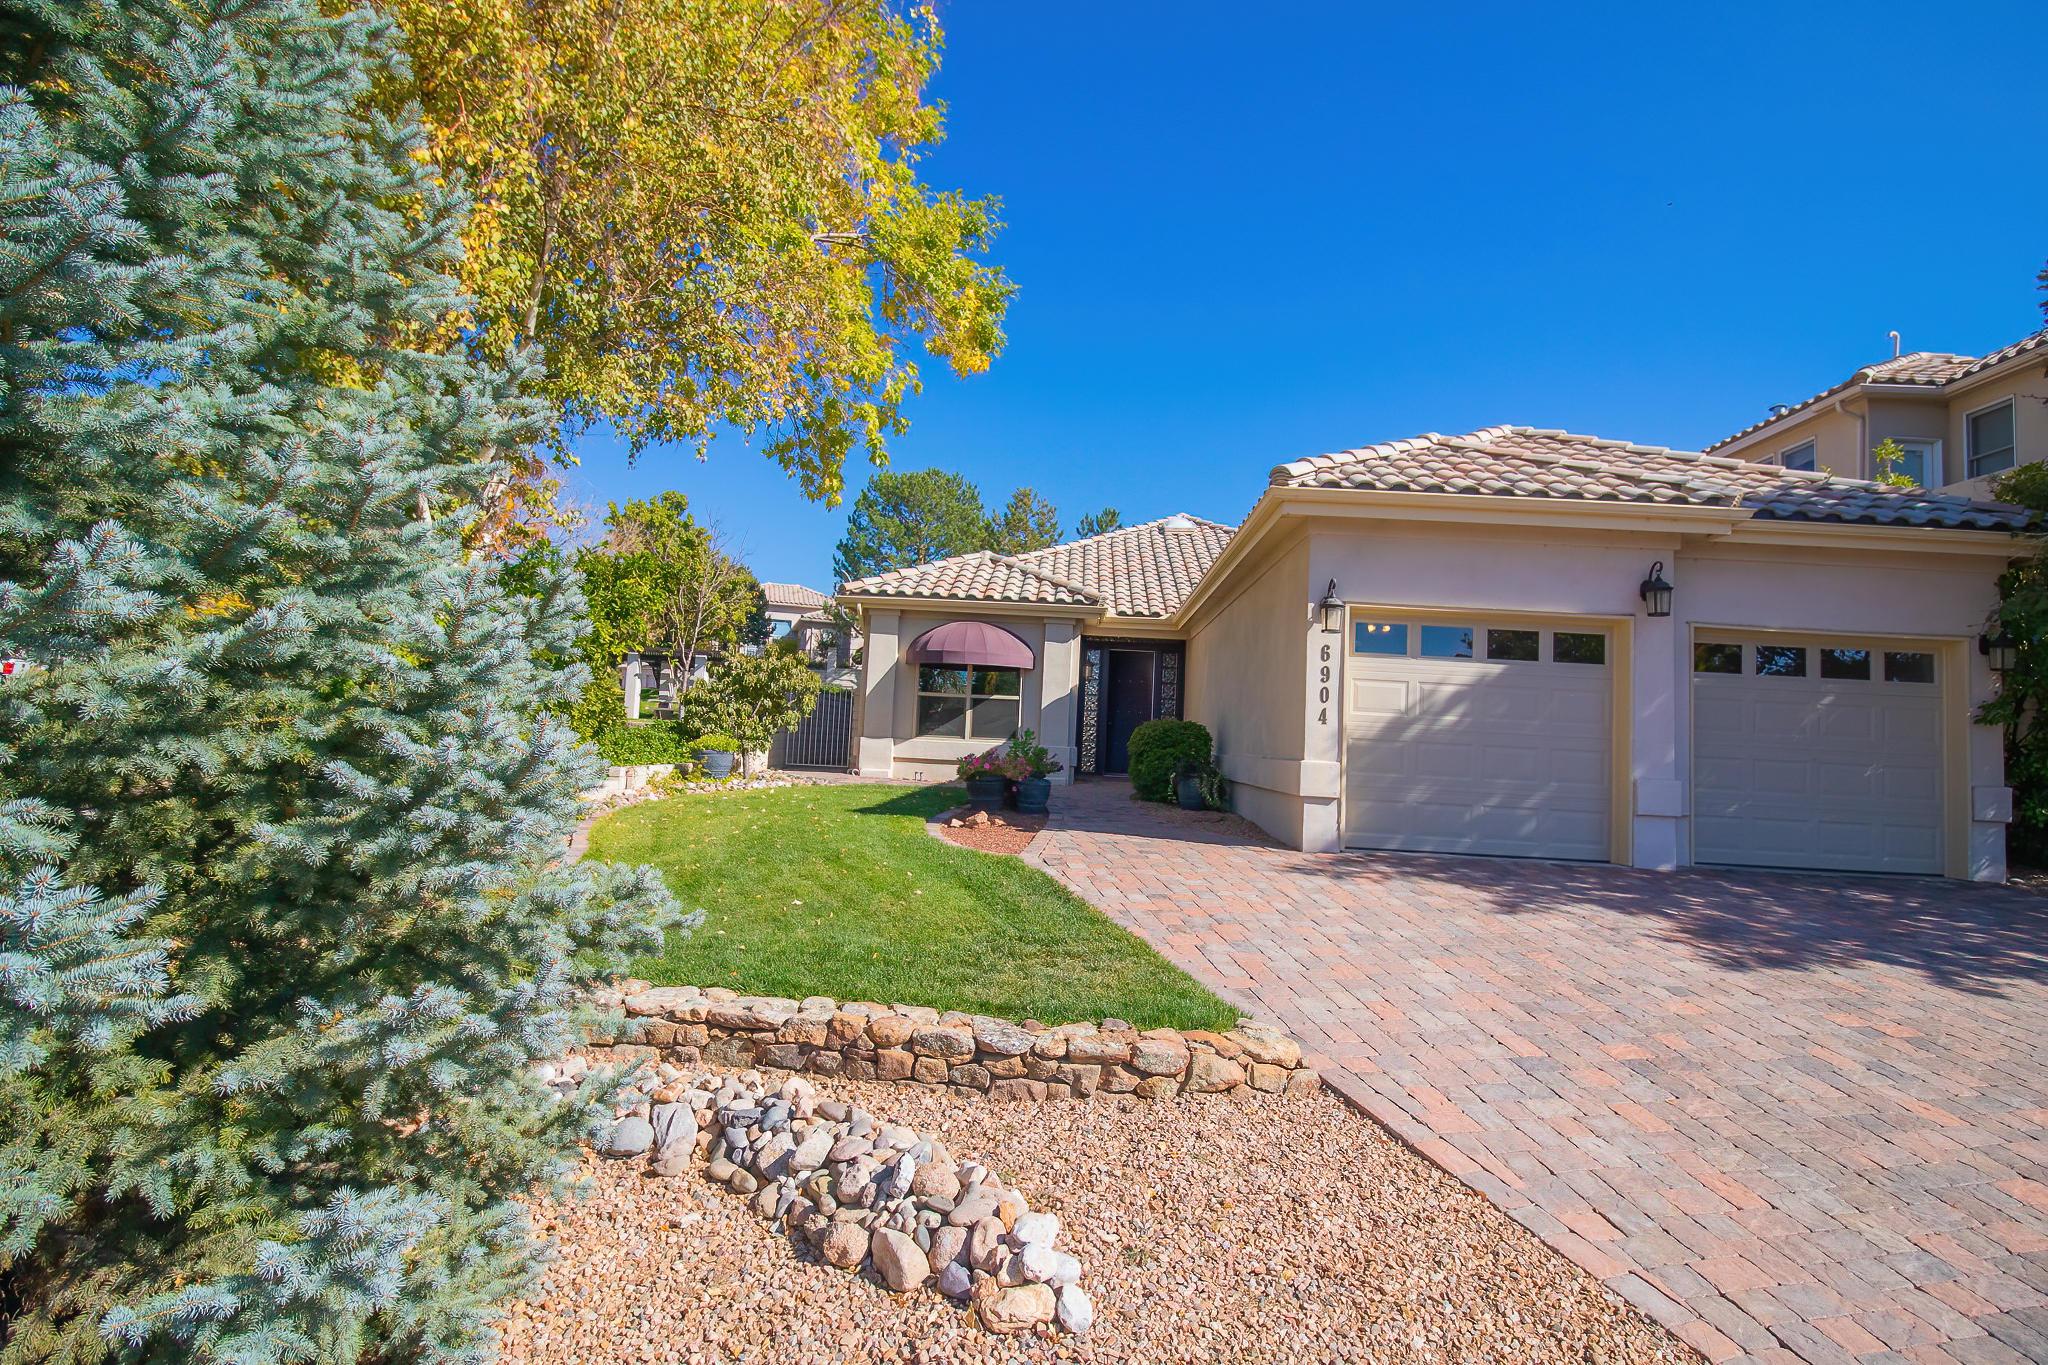 6904 Andalucia NE Property Photo - Albuquerque, NM real estate listing